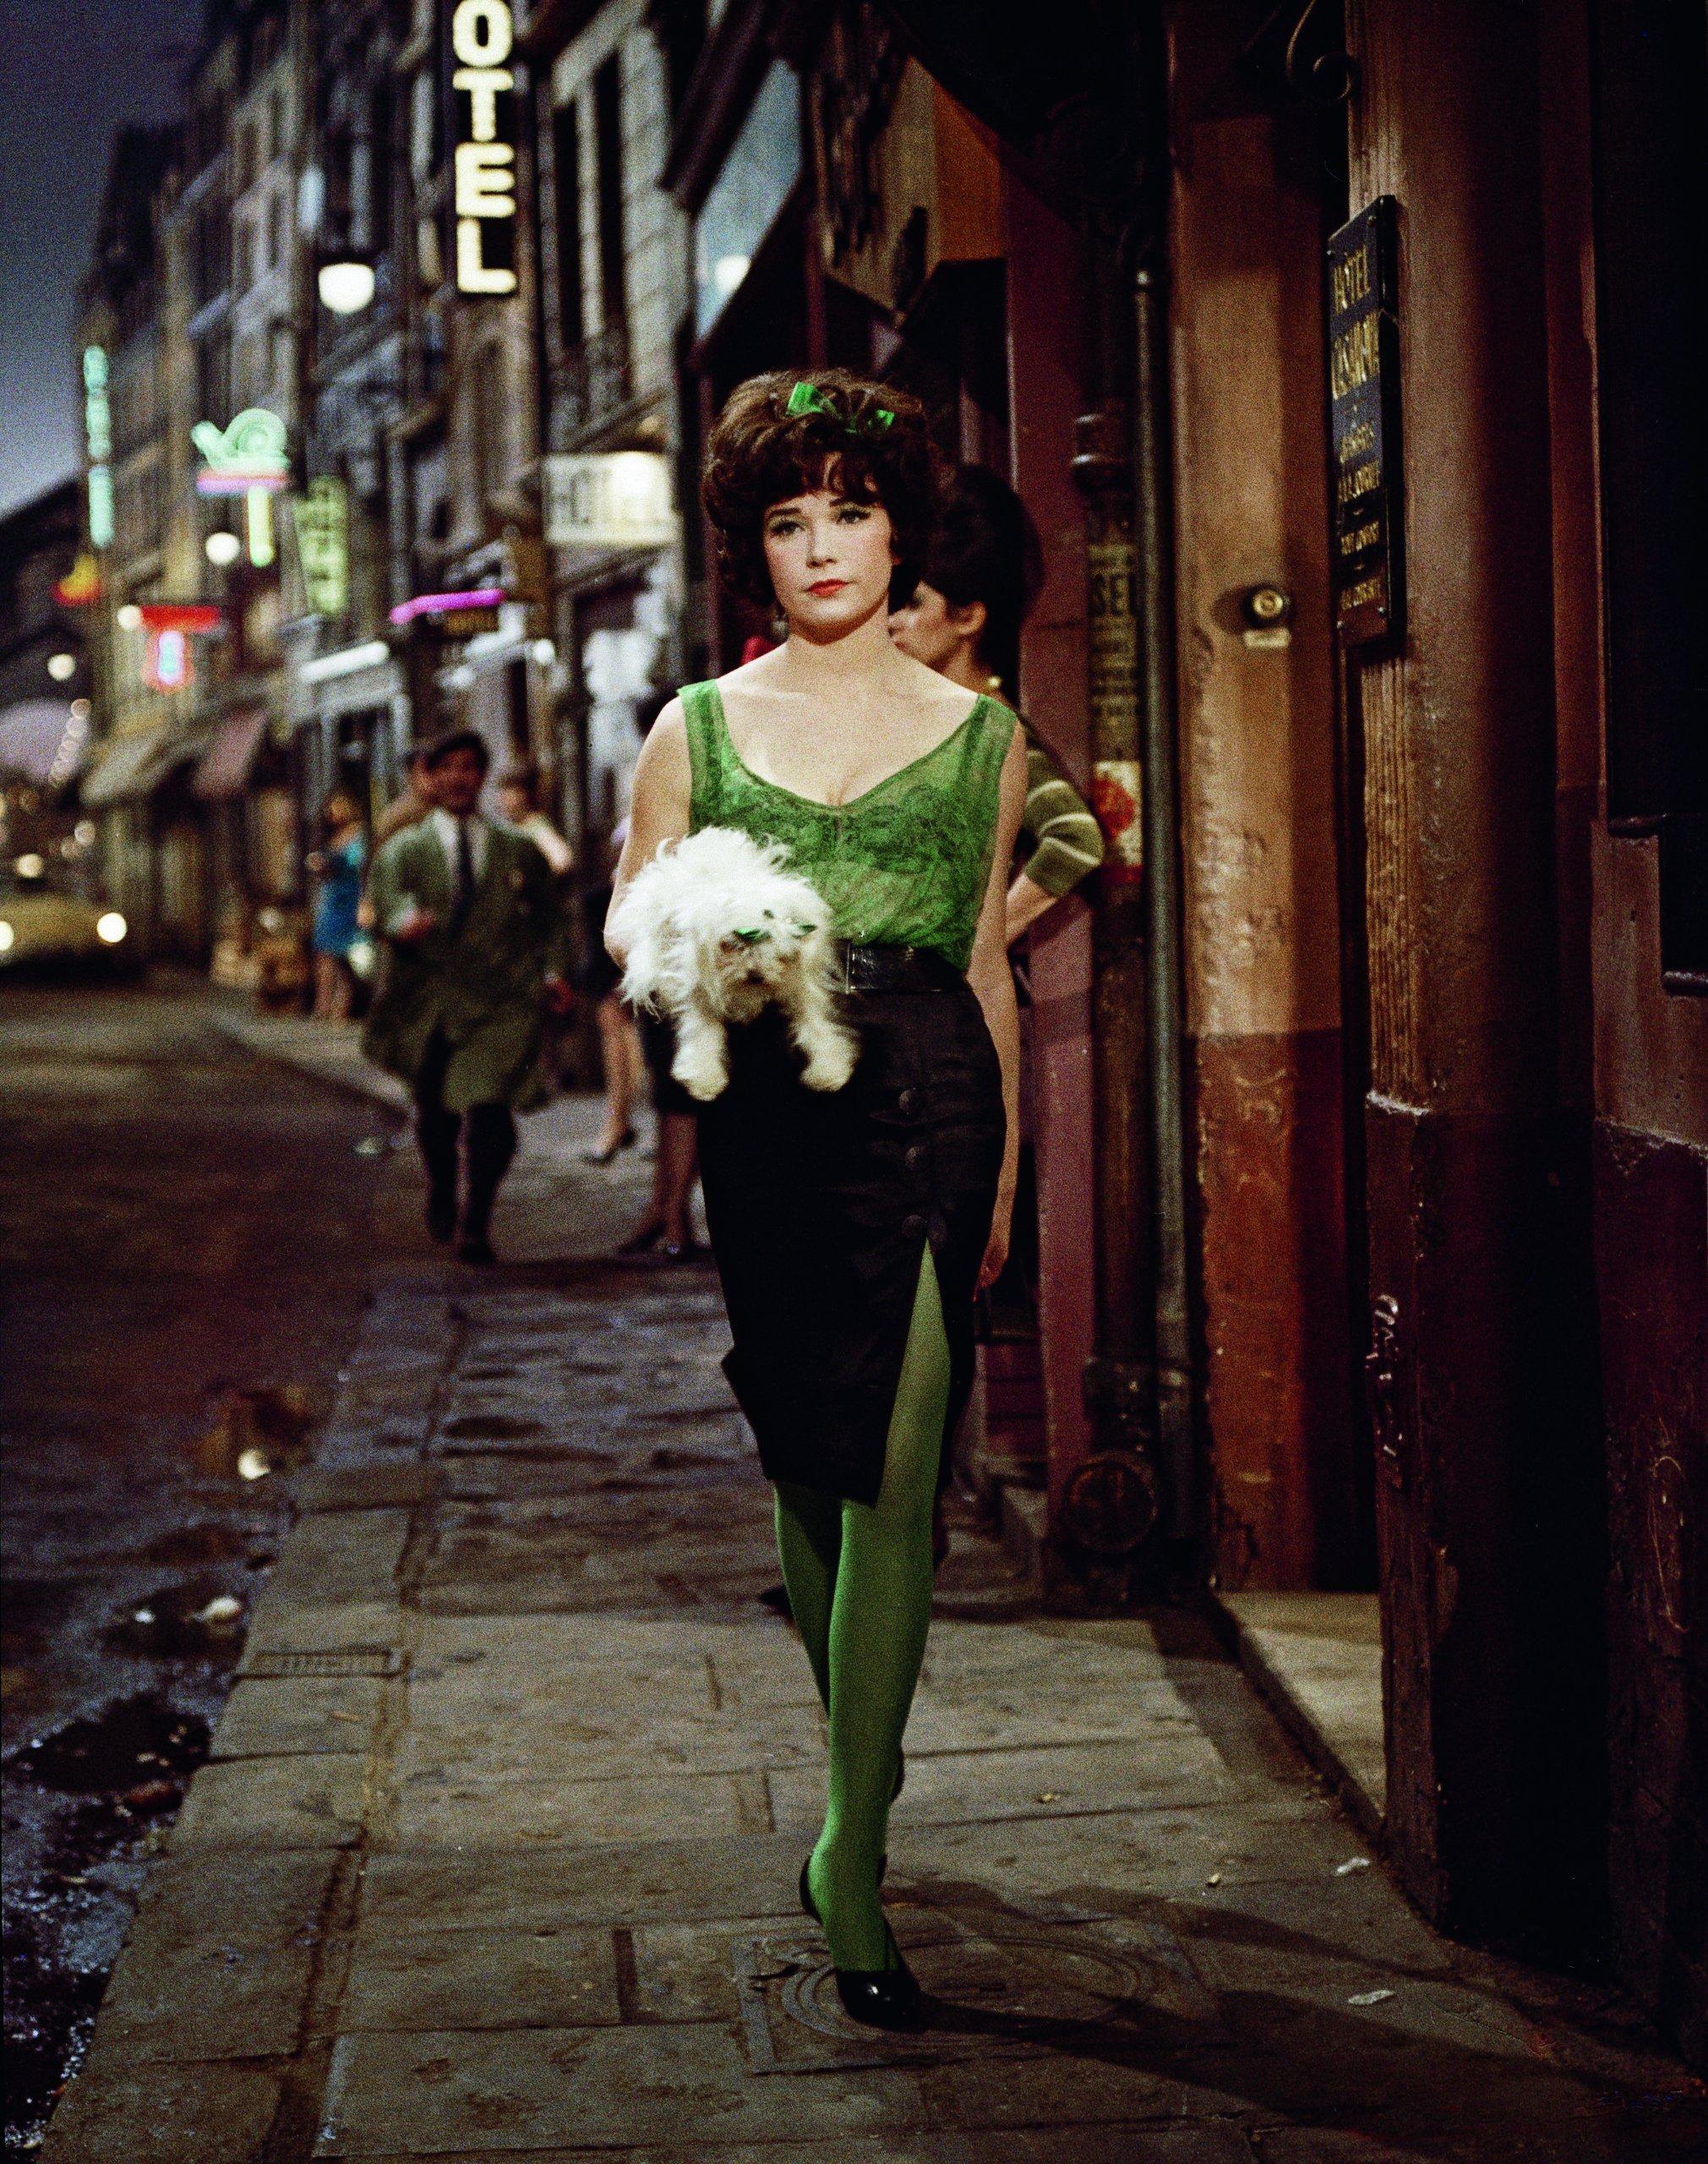 Irma la Dulce, la prostituta de medias verdes (Billy Wilder)